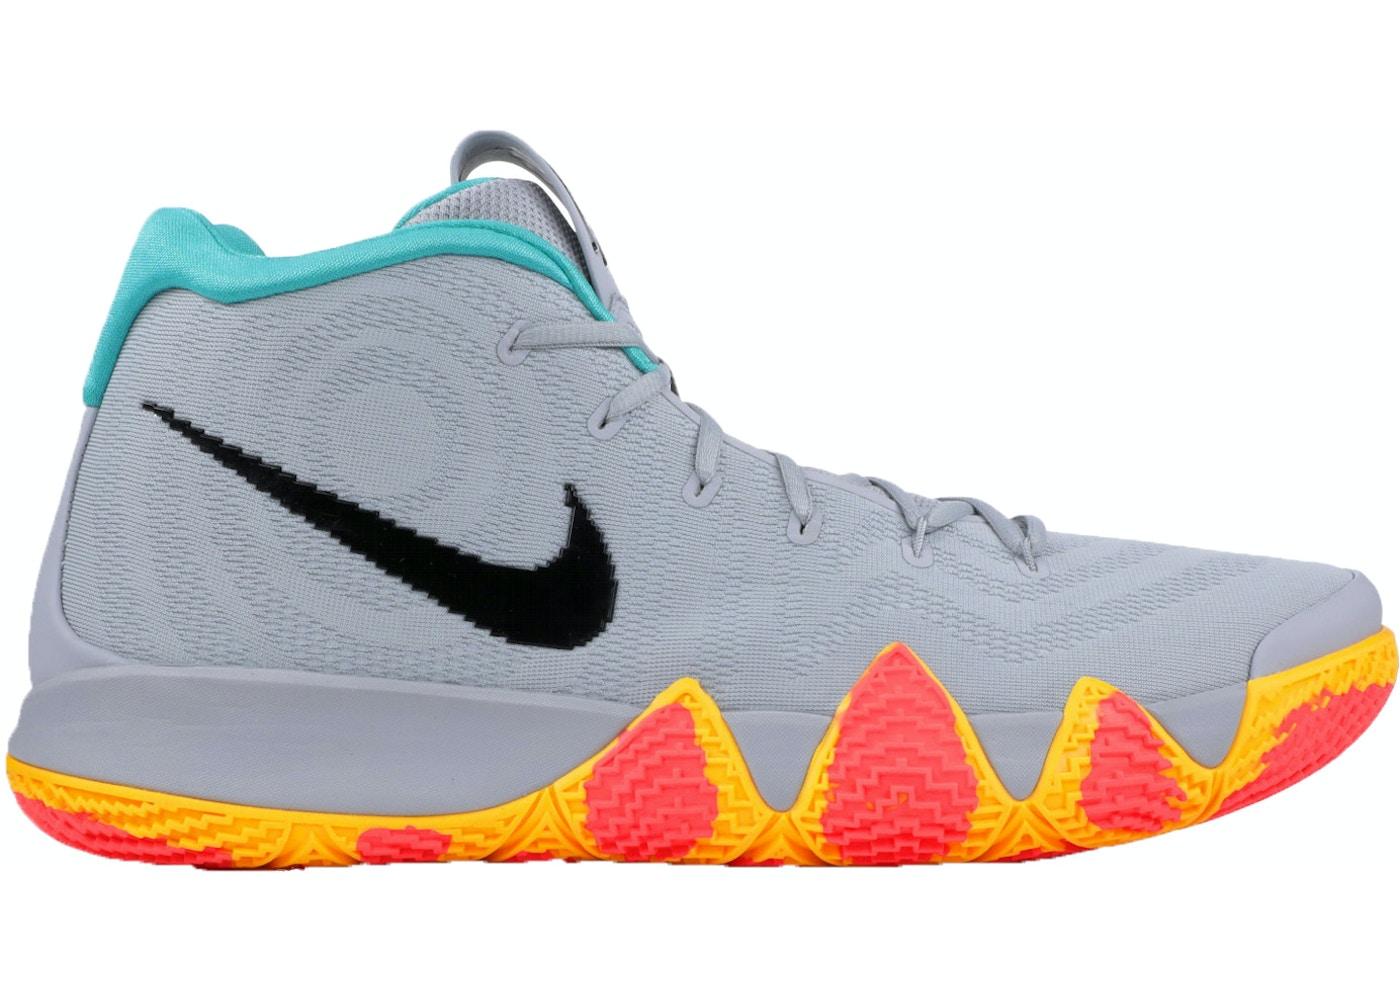 more photos 38acd 16345 Nike Basketball Kyrie Shoes - Highest Bid